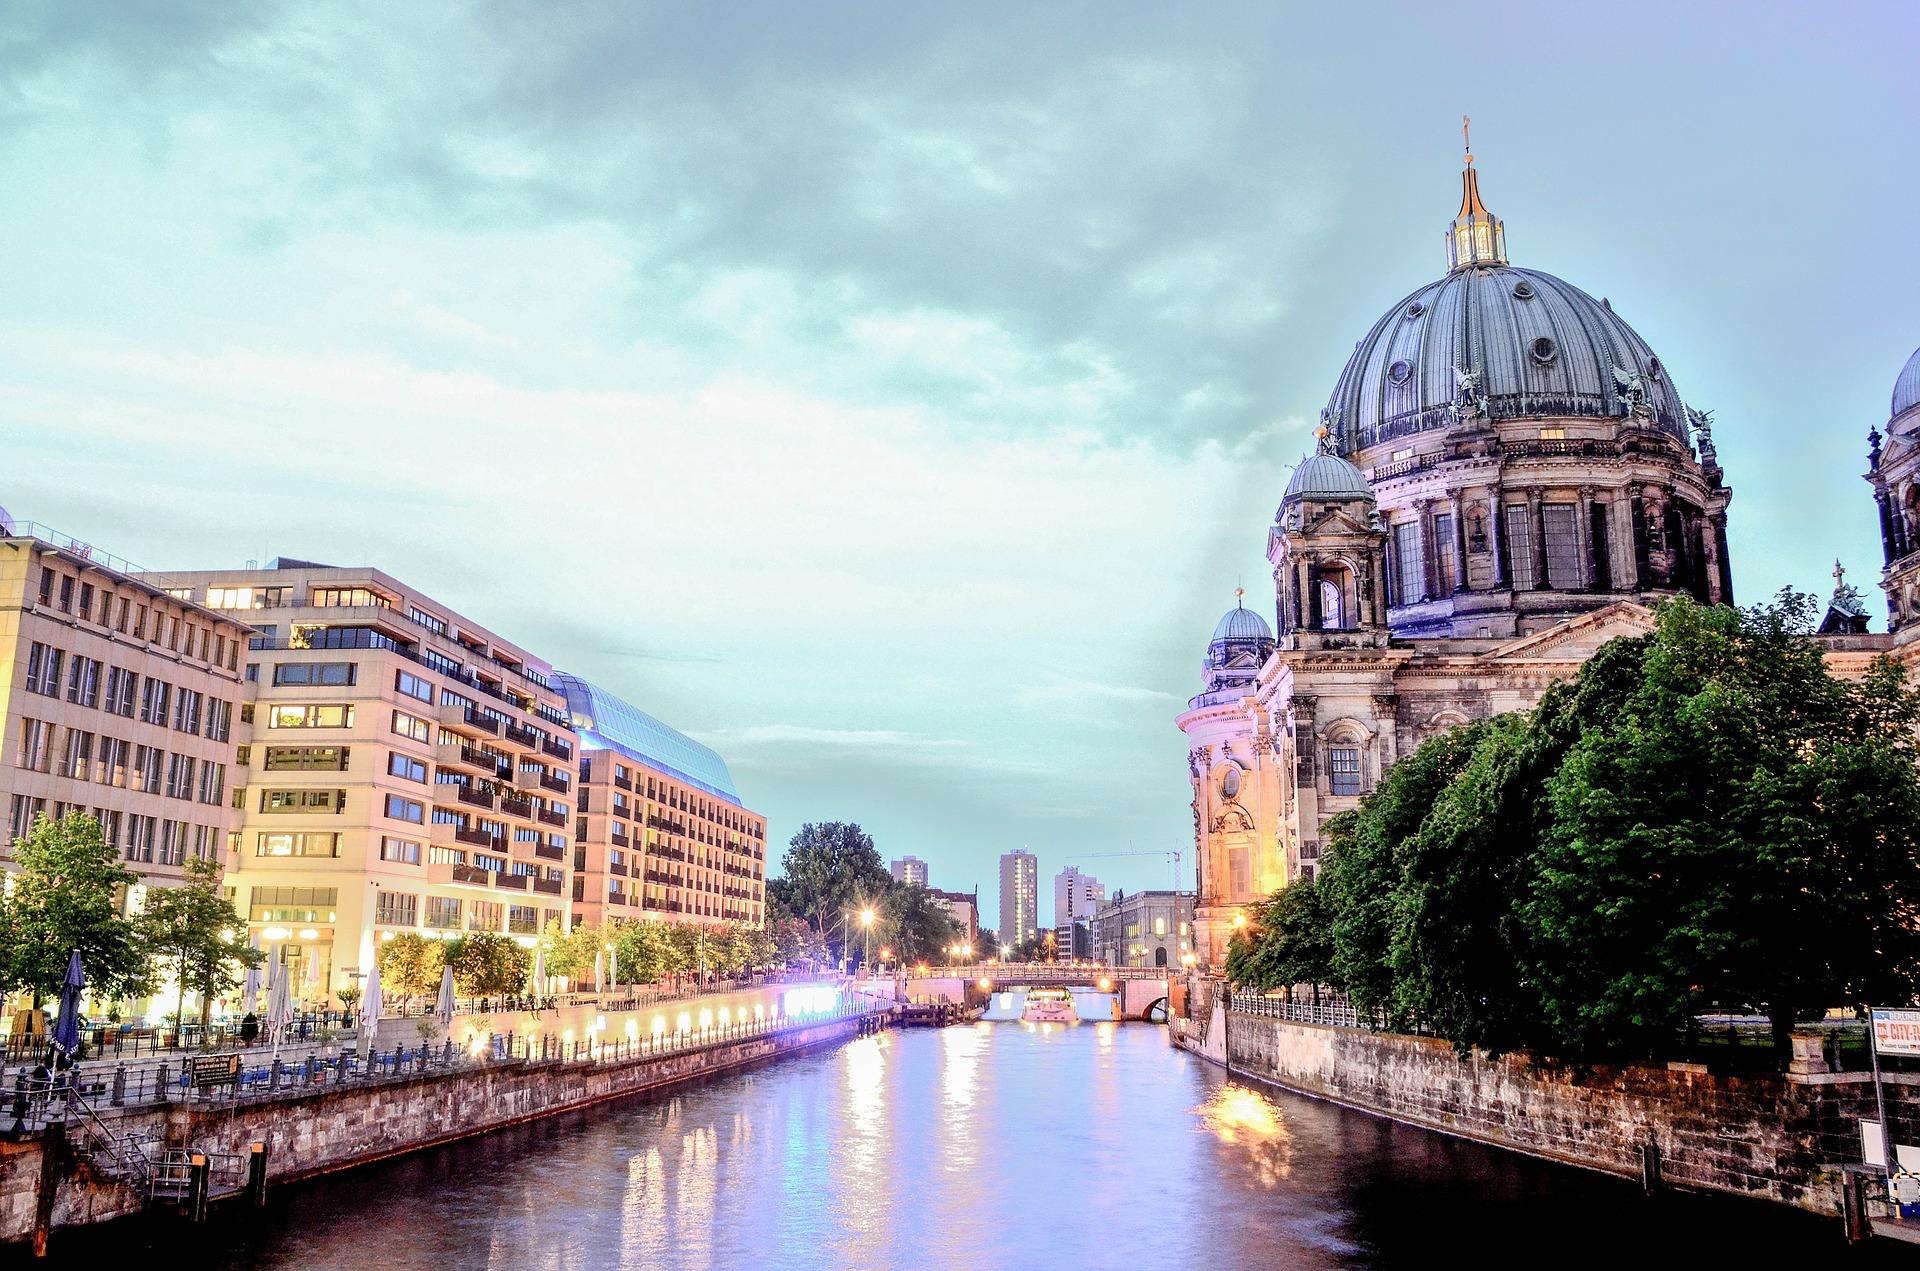 Berlin Fashion Week 2021: Kilian Kerner, Kylie Jenner and Co.